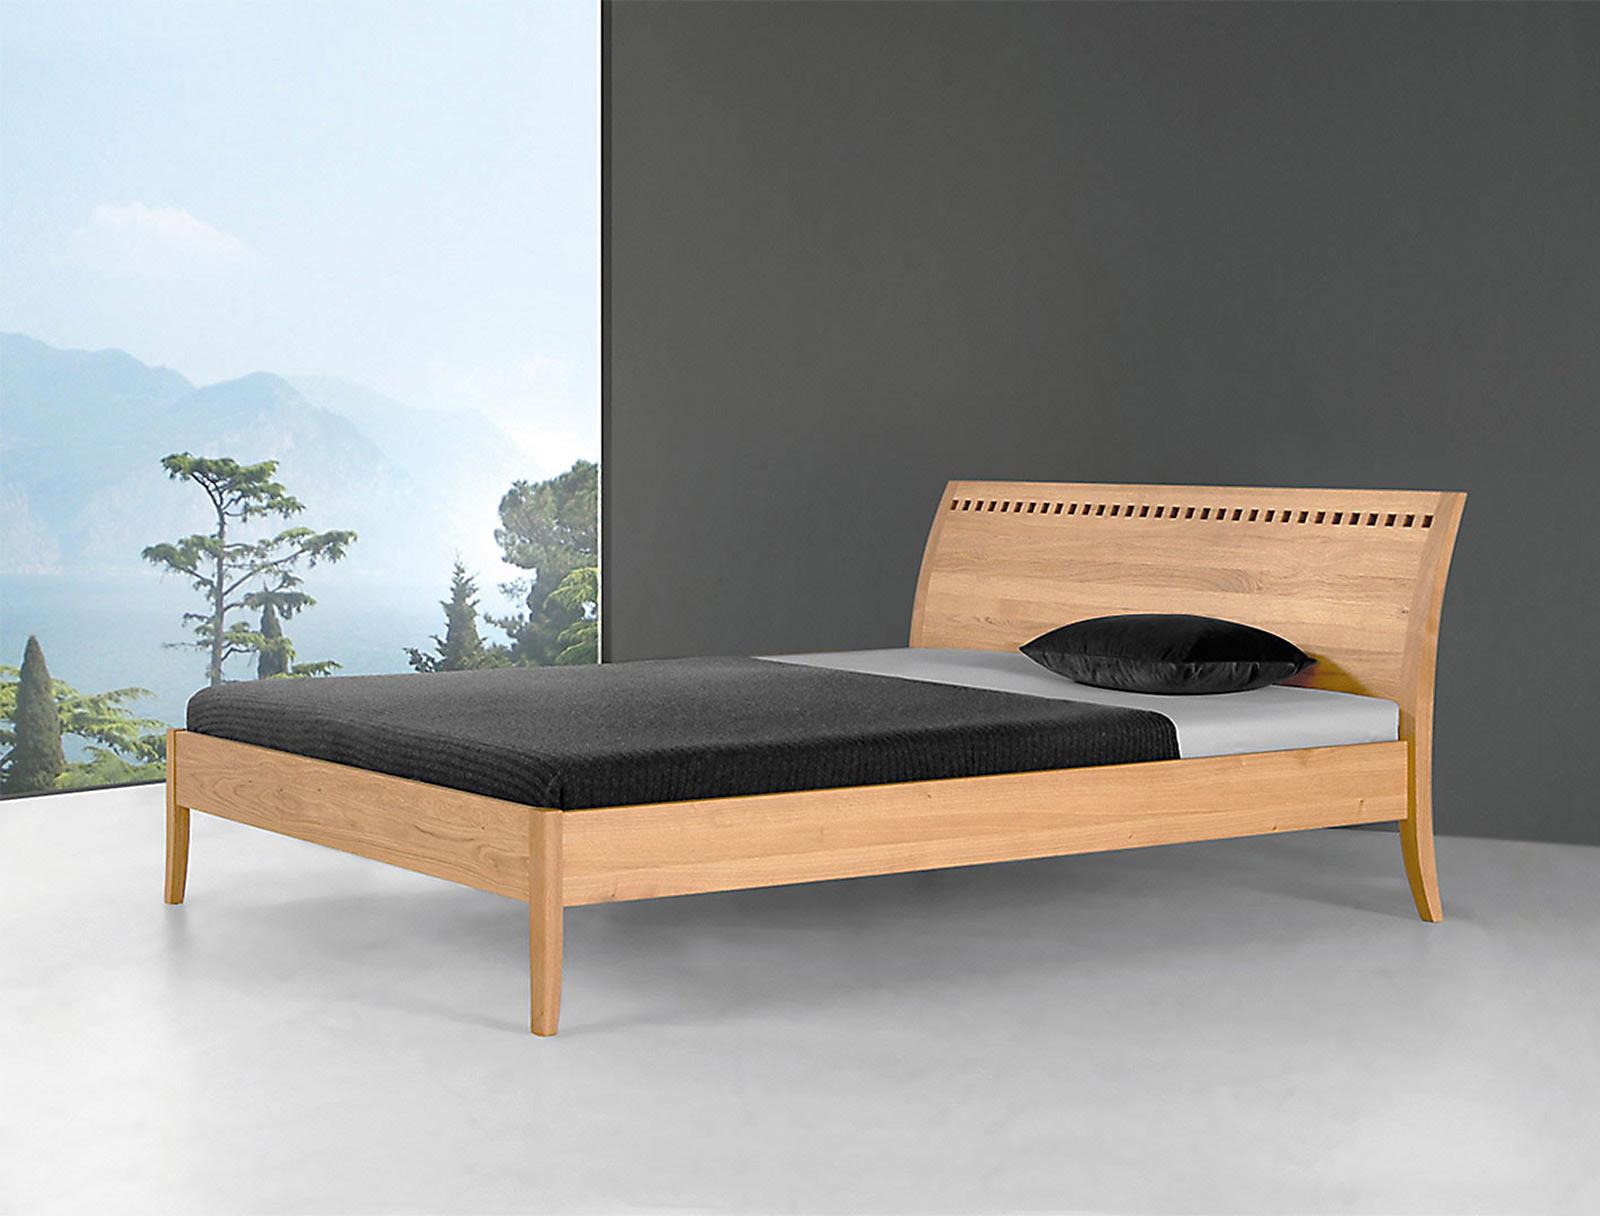 Holzbett design  Massives Holzbett - Design Castilio - Coburger Werkstätten - PureNature